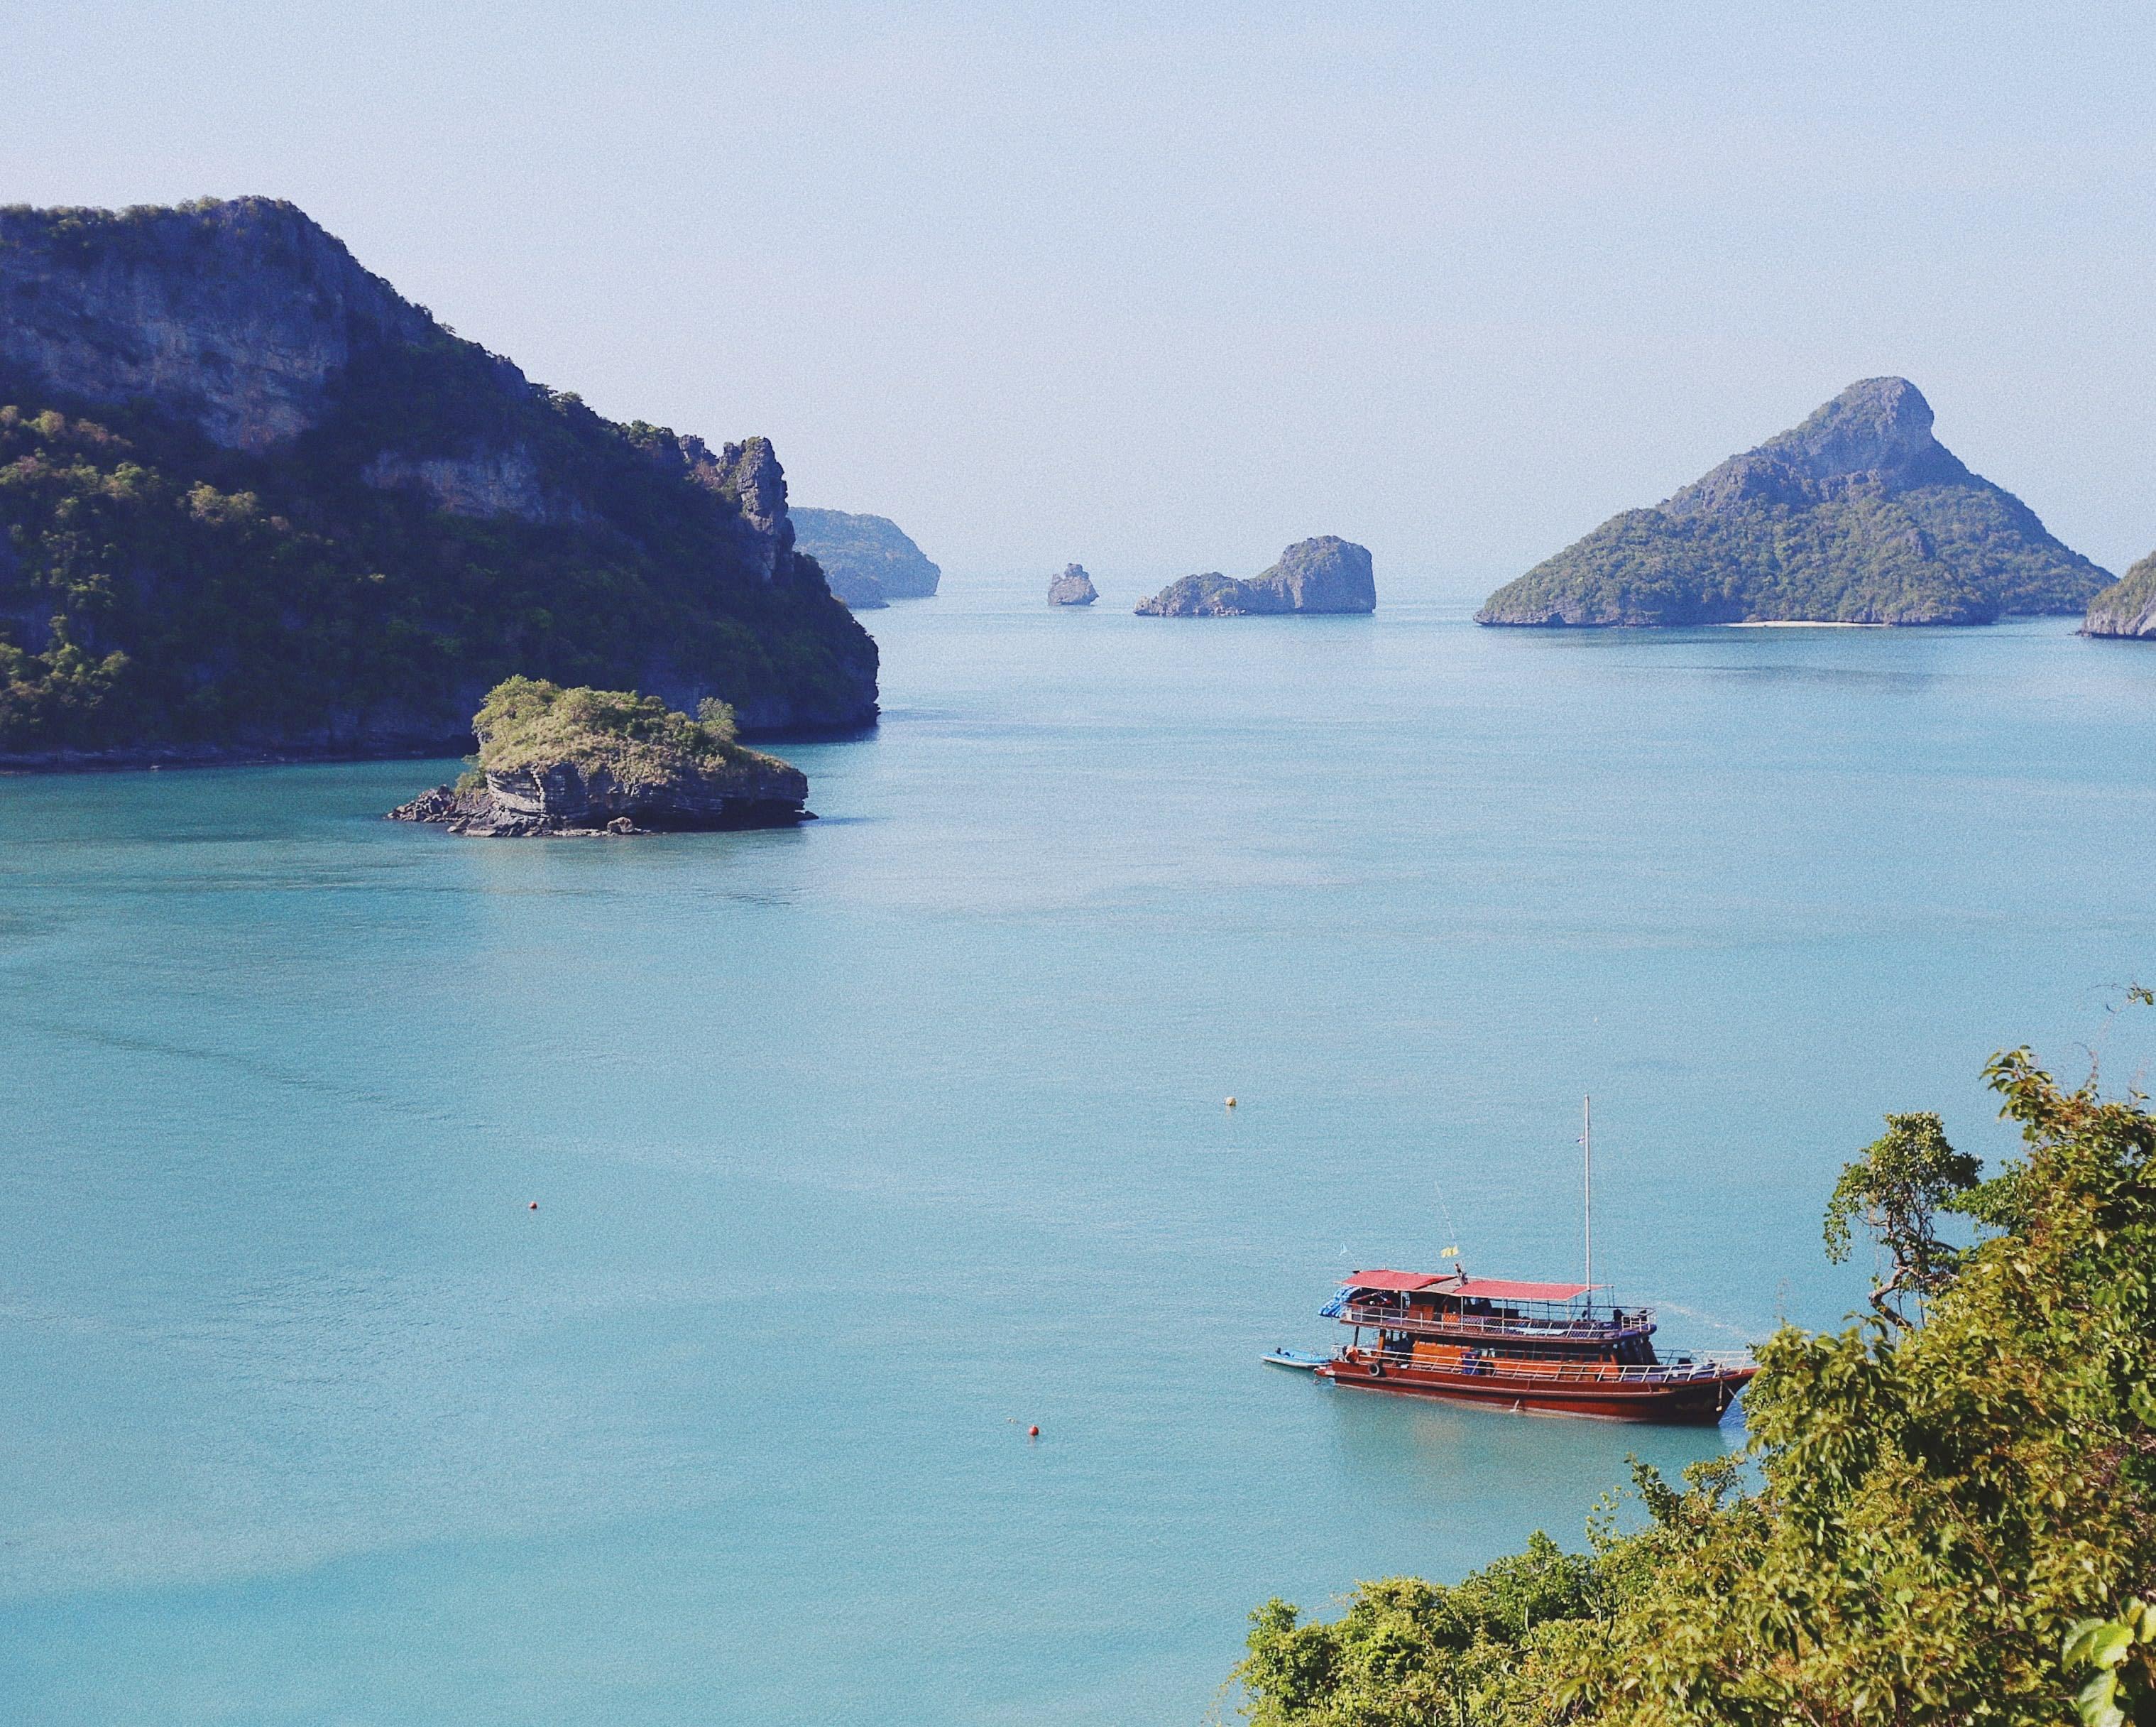 Destinasi Liburan ke Thailand Selain Bangkok: Koh Samui